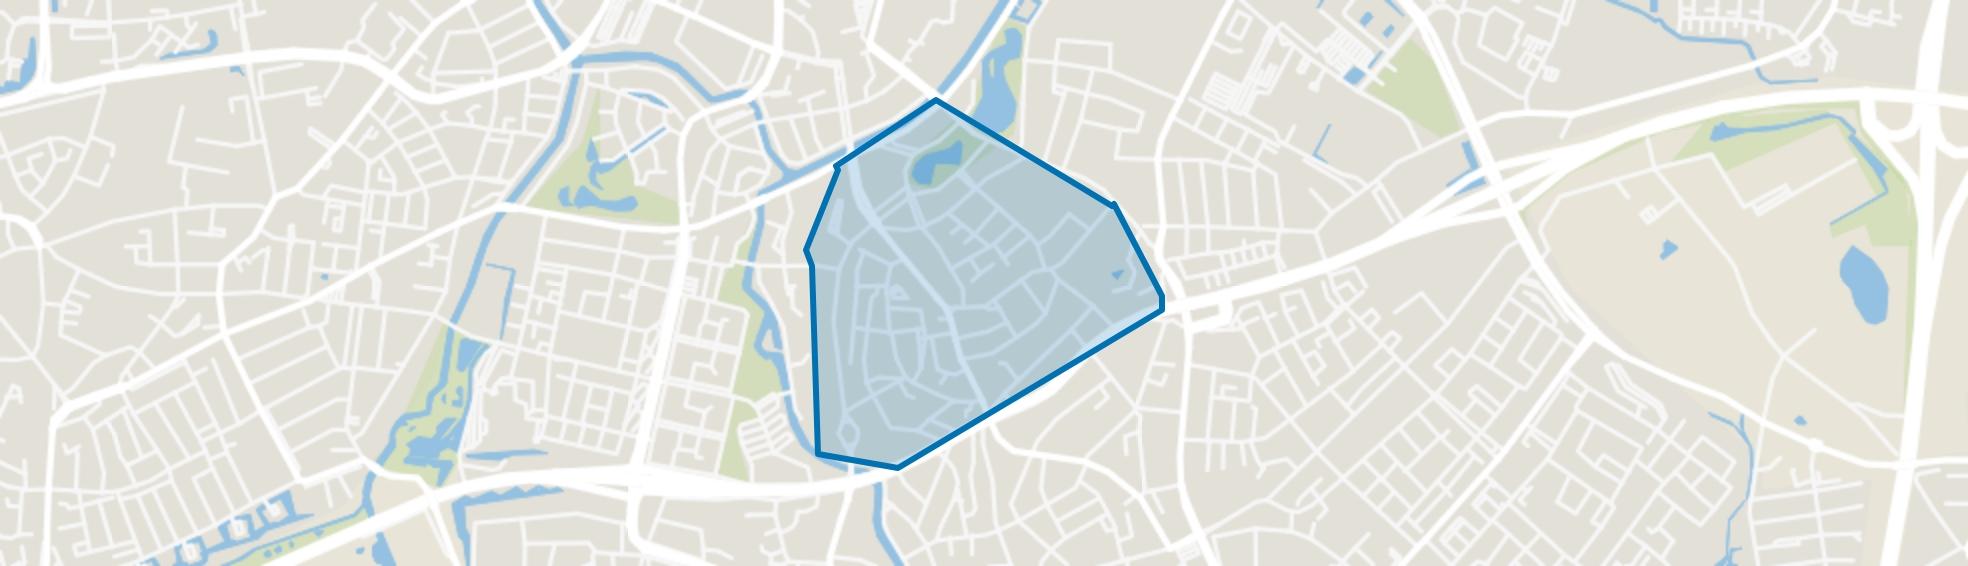 Zandberg, Breda map